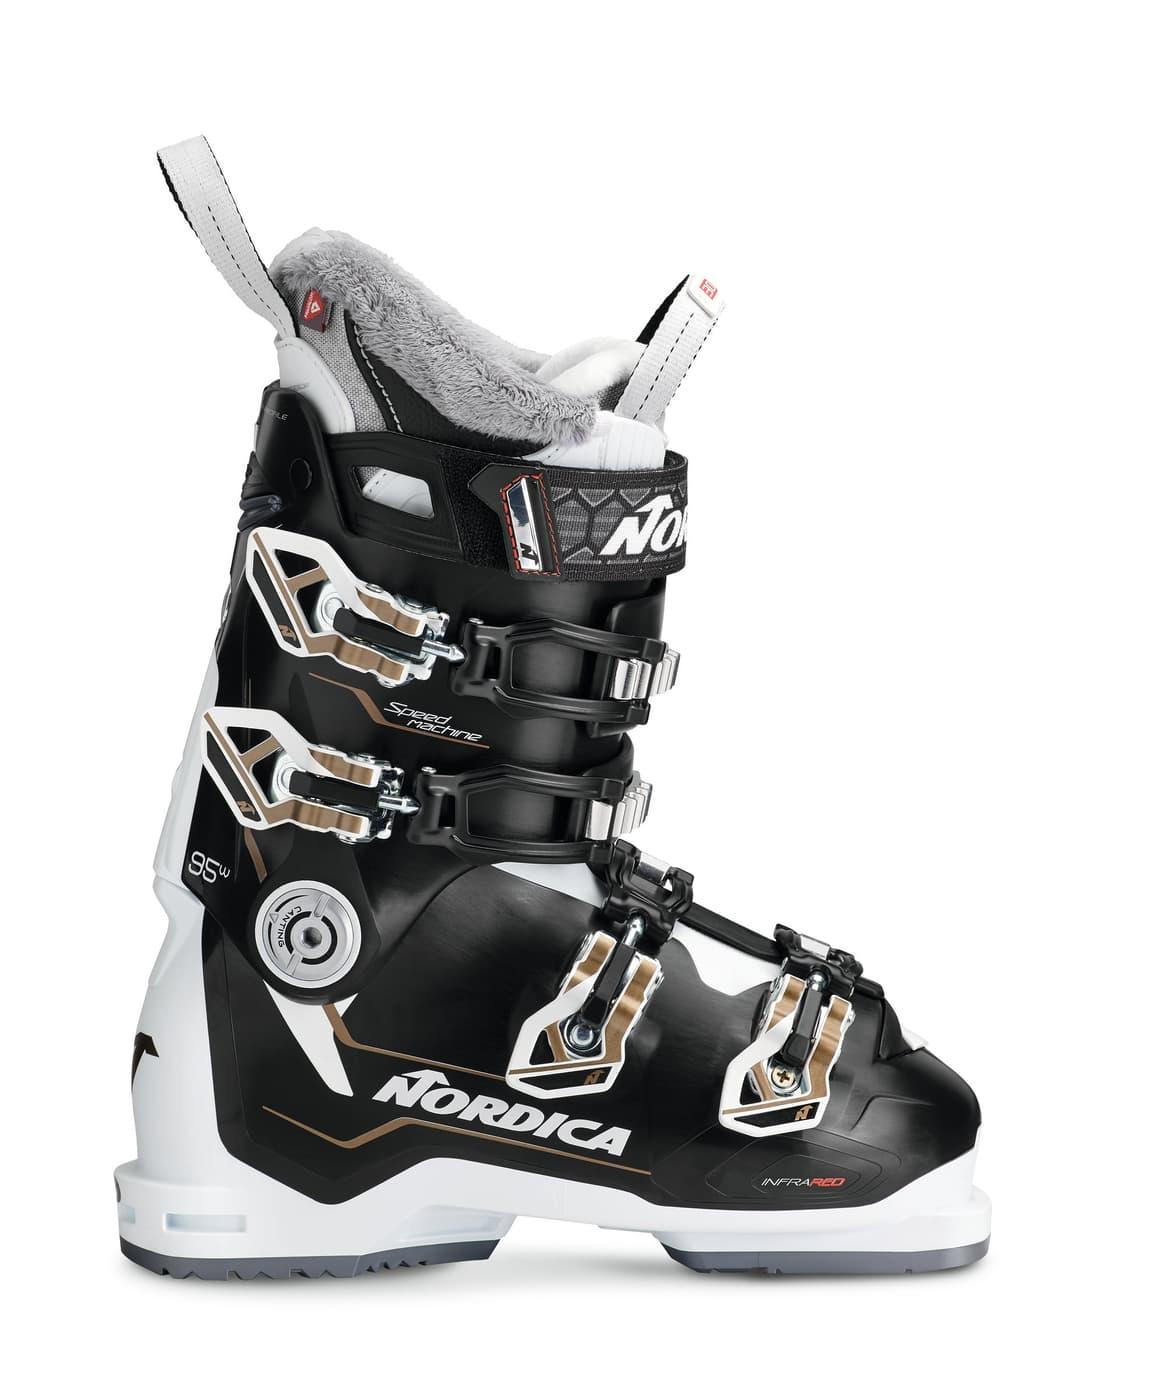 Nordica Speedmachine Ski De Chaussure Femme 95 Pour WD9EHY2I